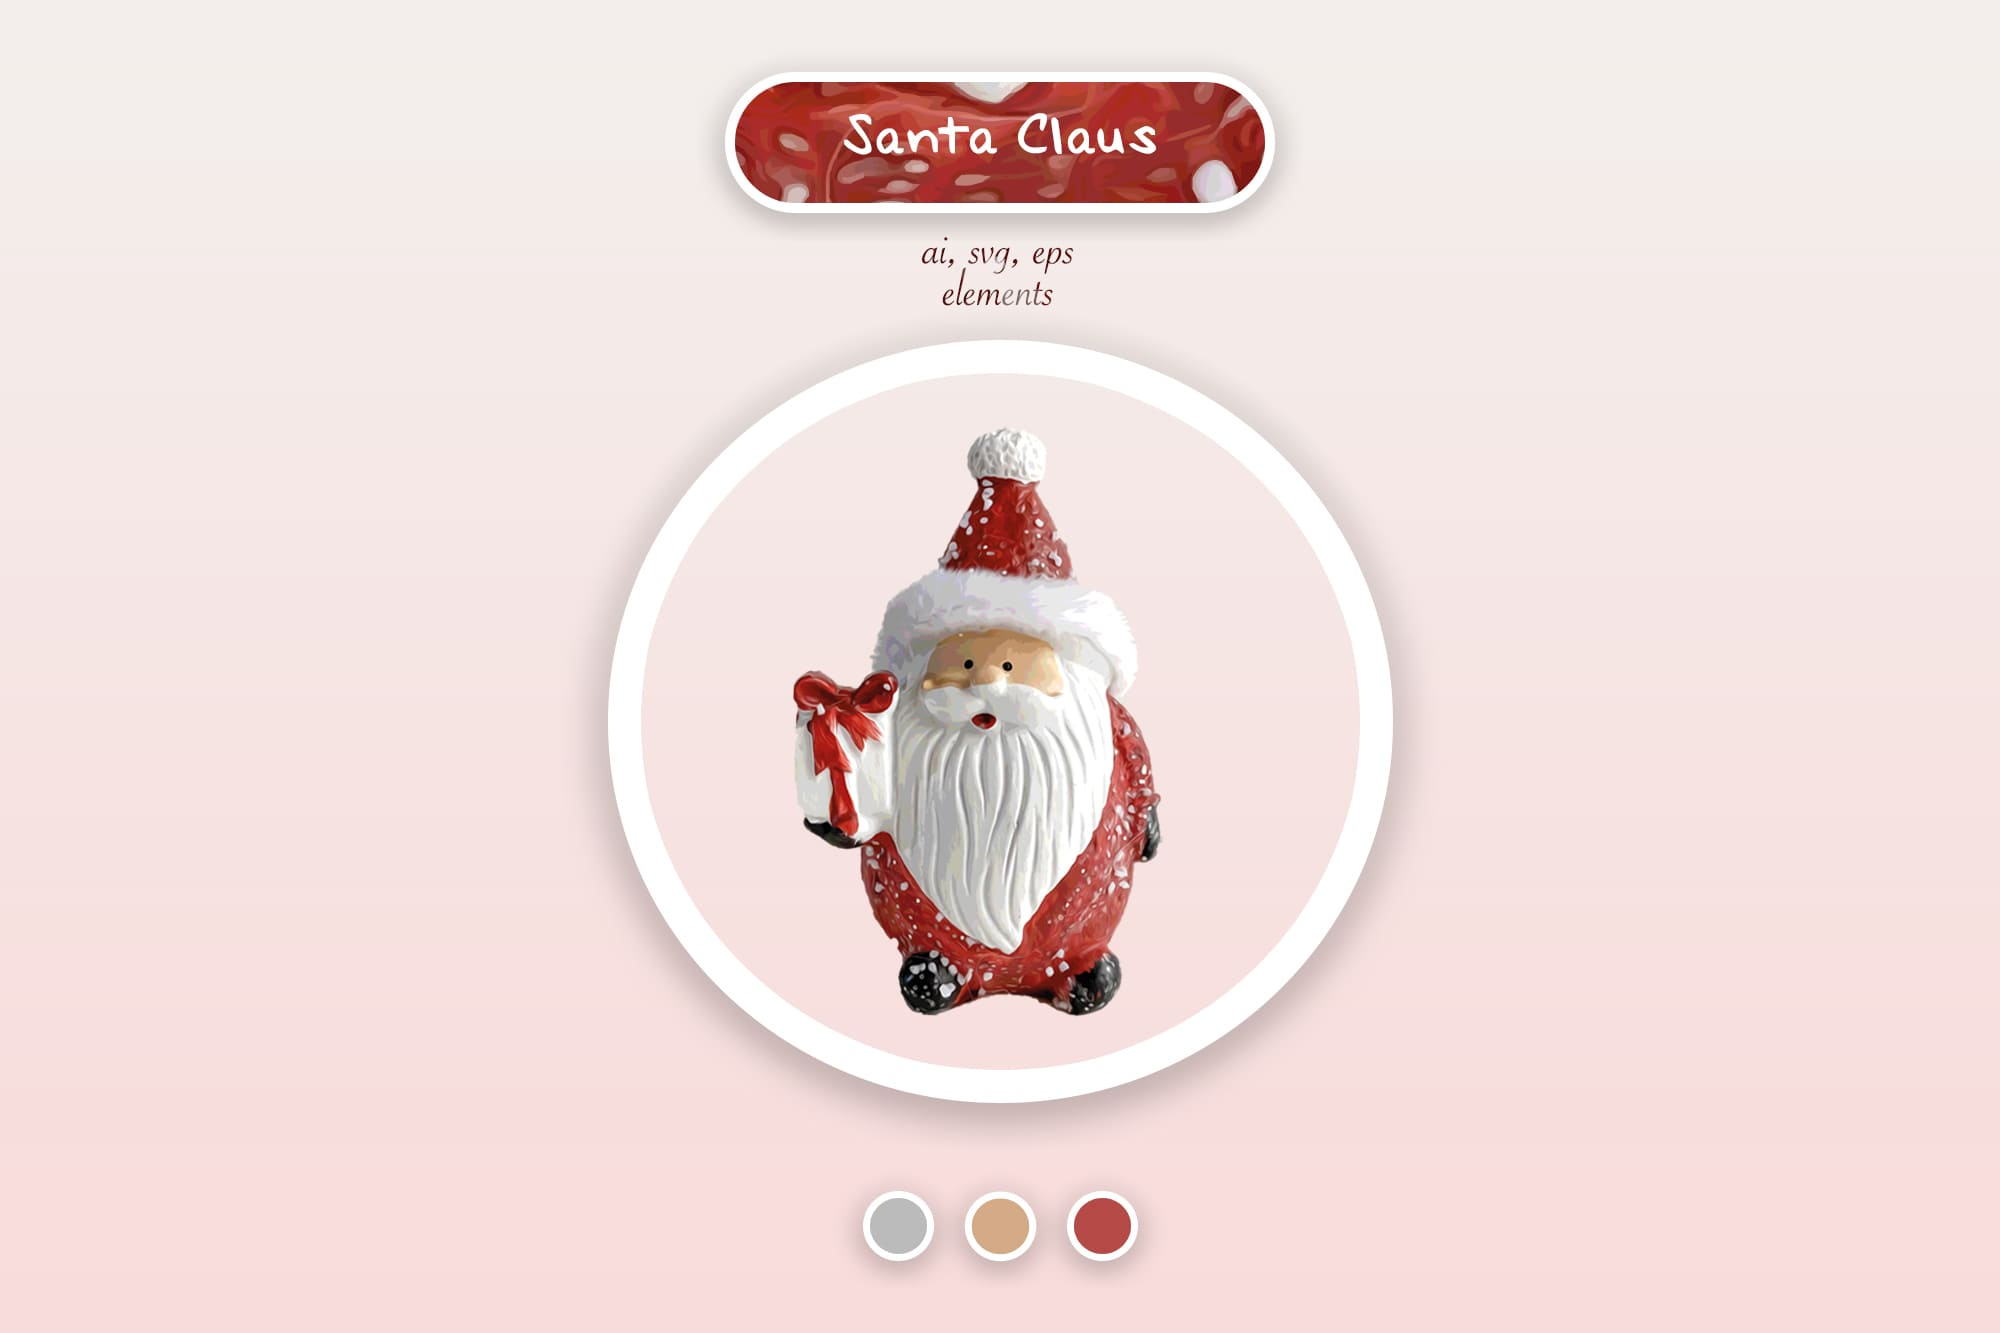 496 Christmas Illustrations: Christmas Vectors Bundle SVG, EPS, AI - Santa Claus a